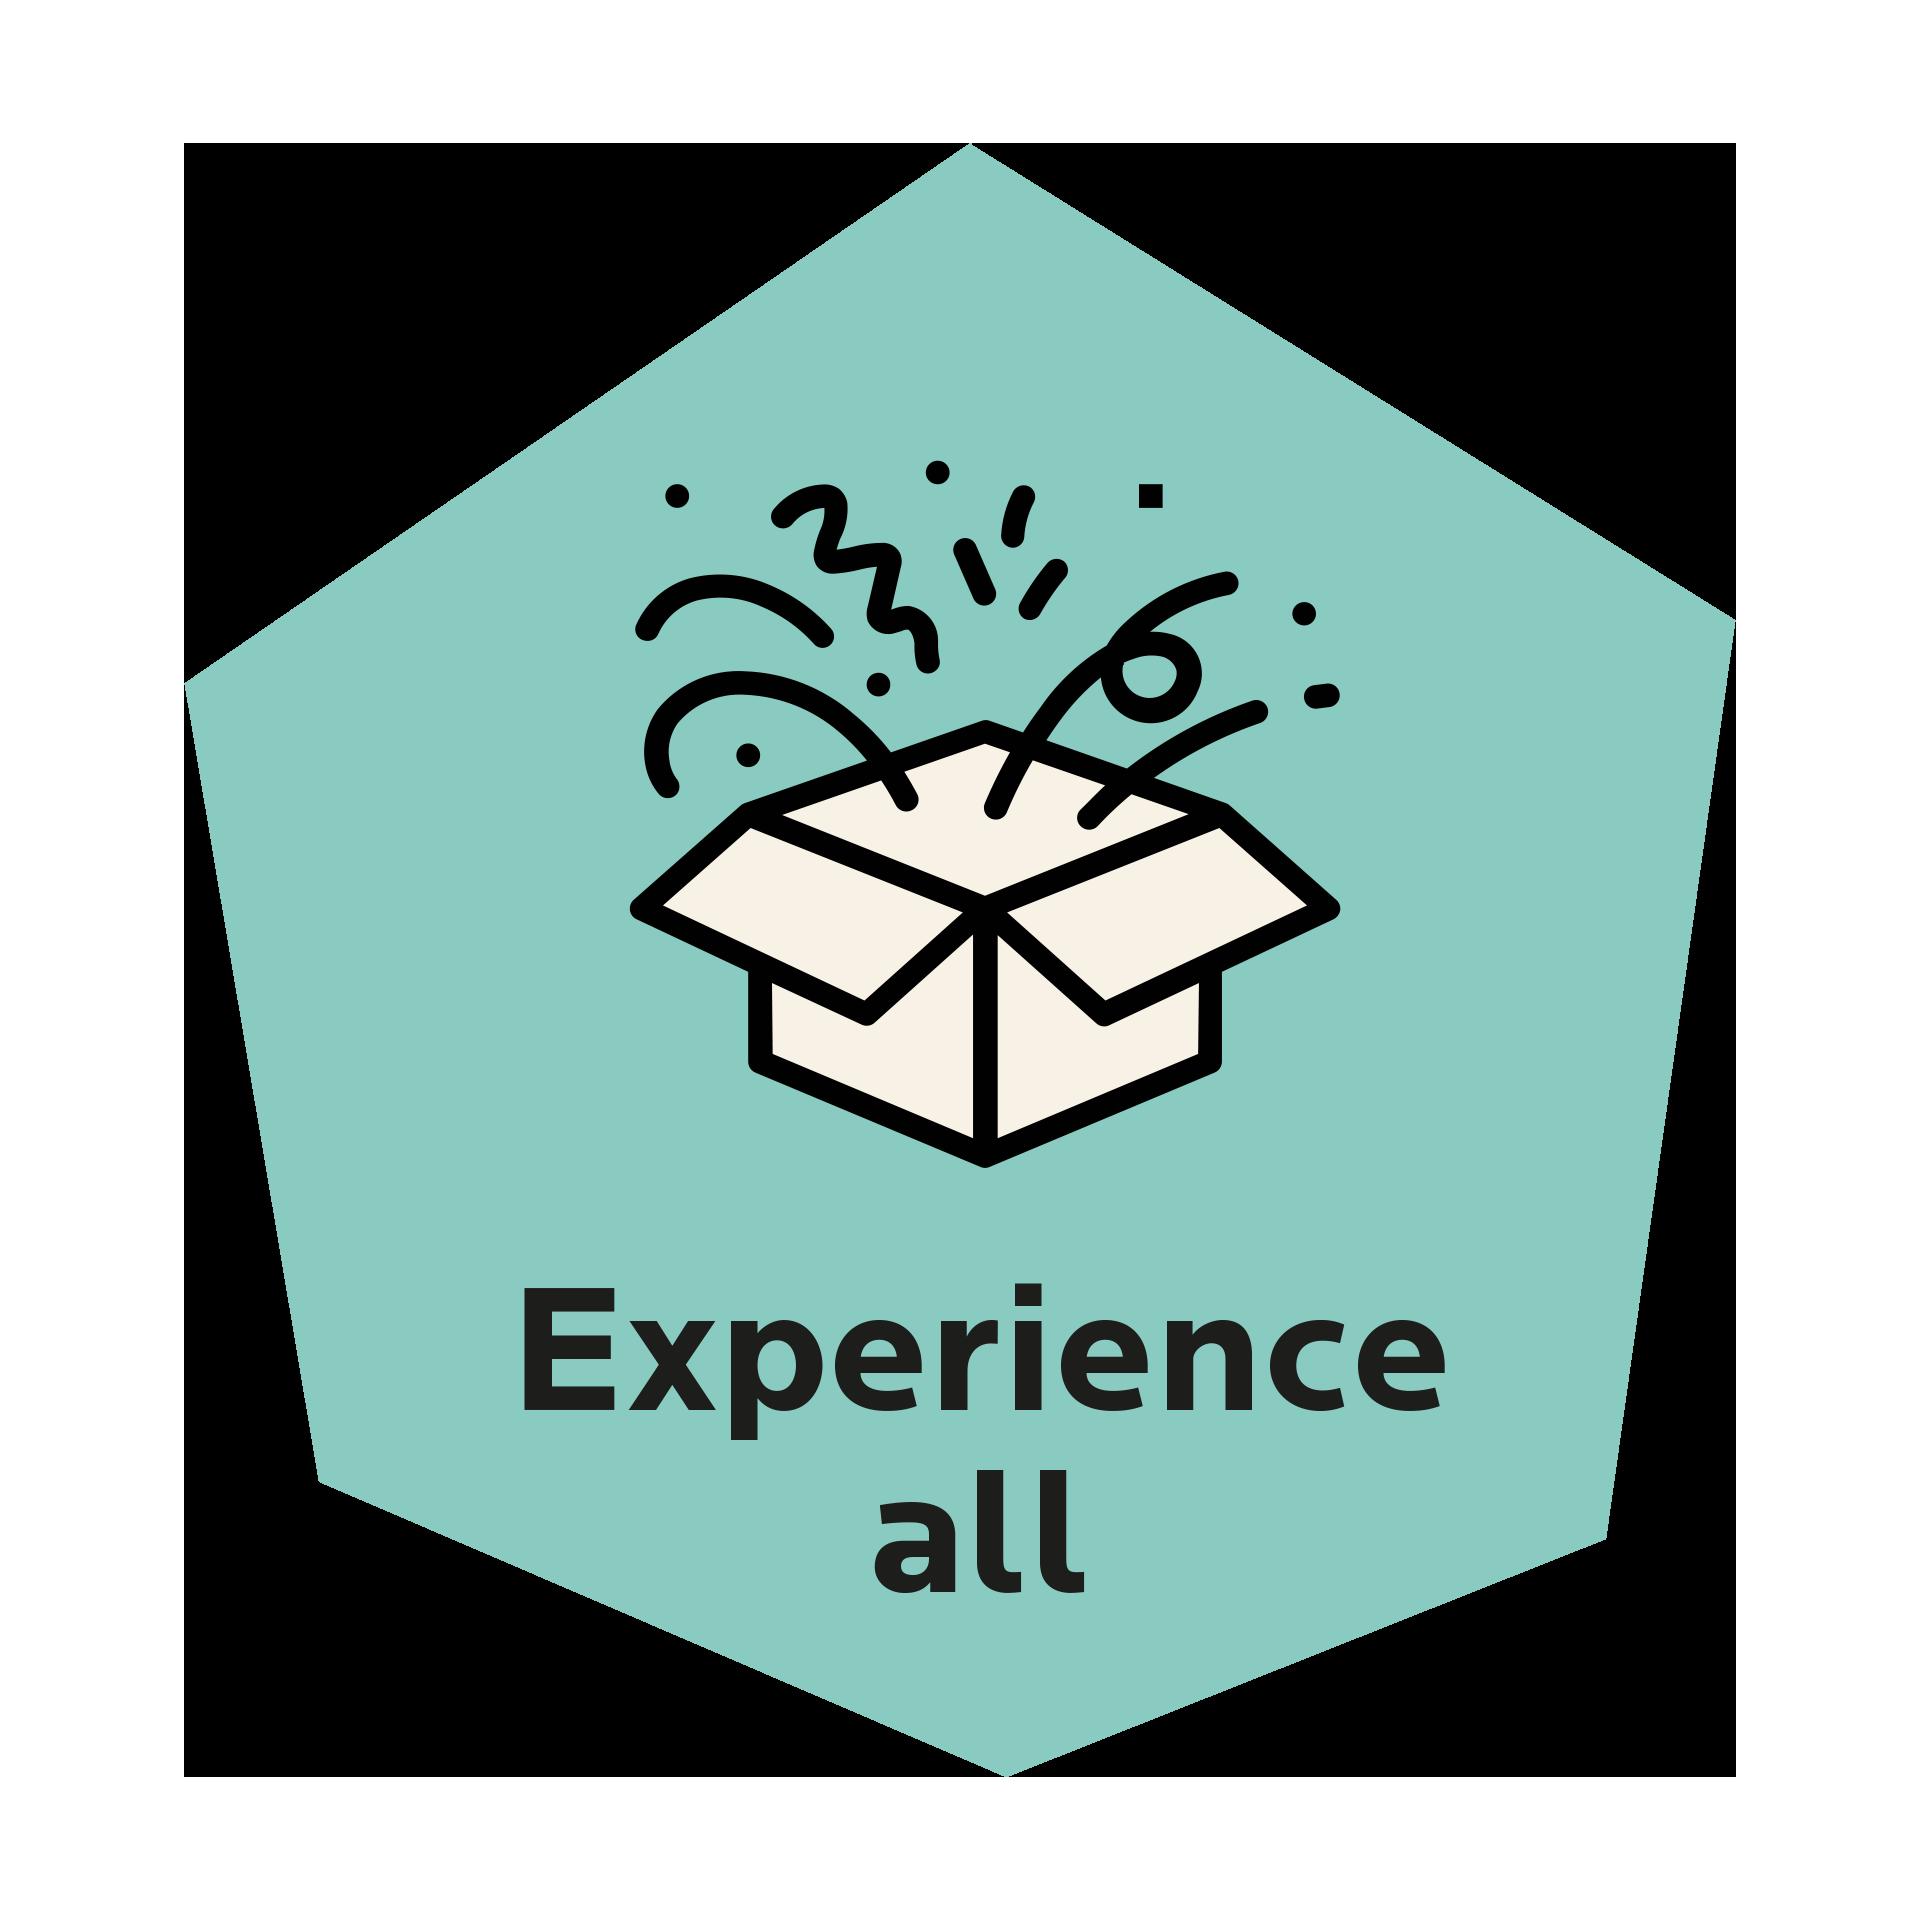 Illustration över experienceall@expectrum - mötespaket hos expectrum i Västerås